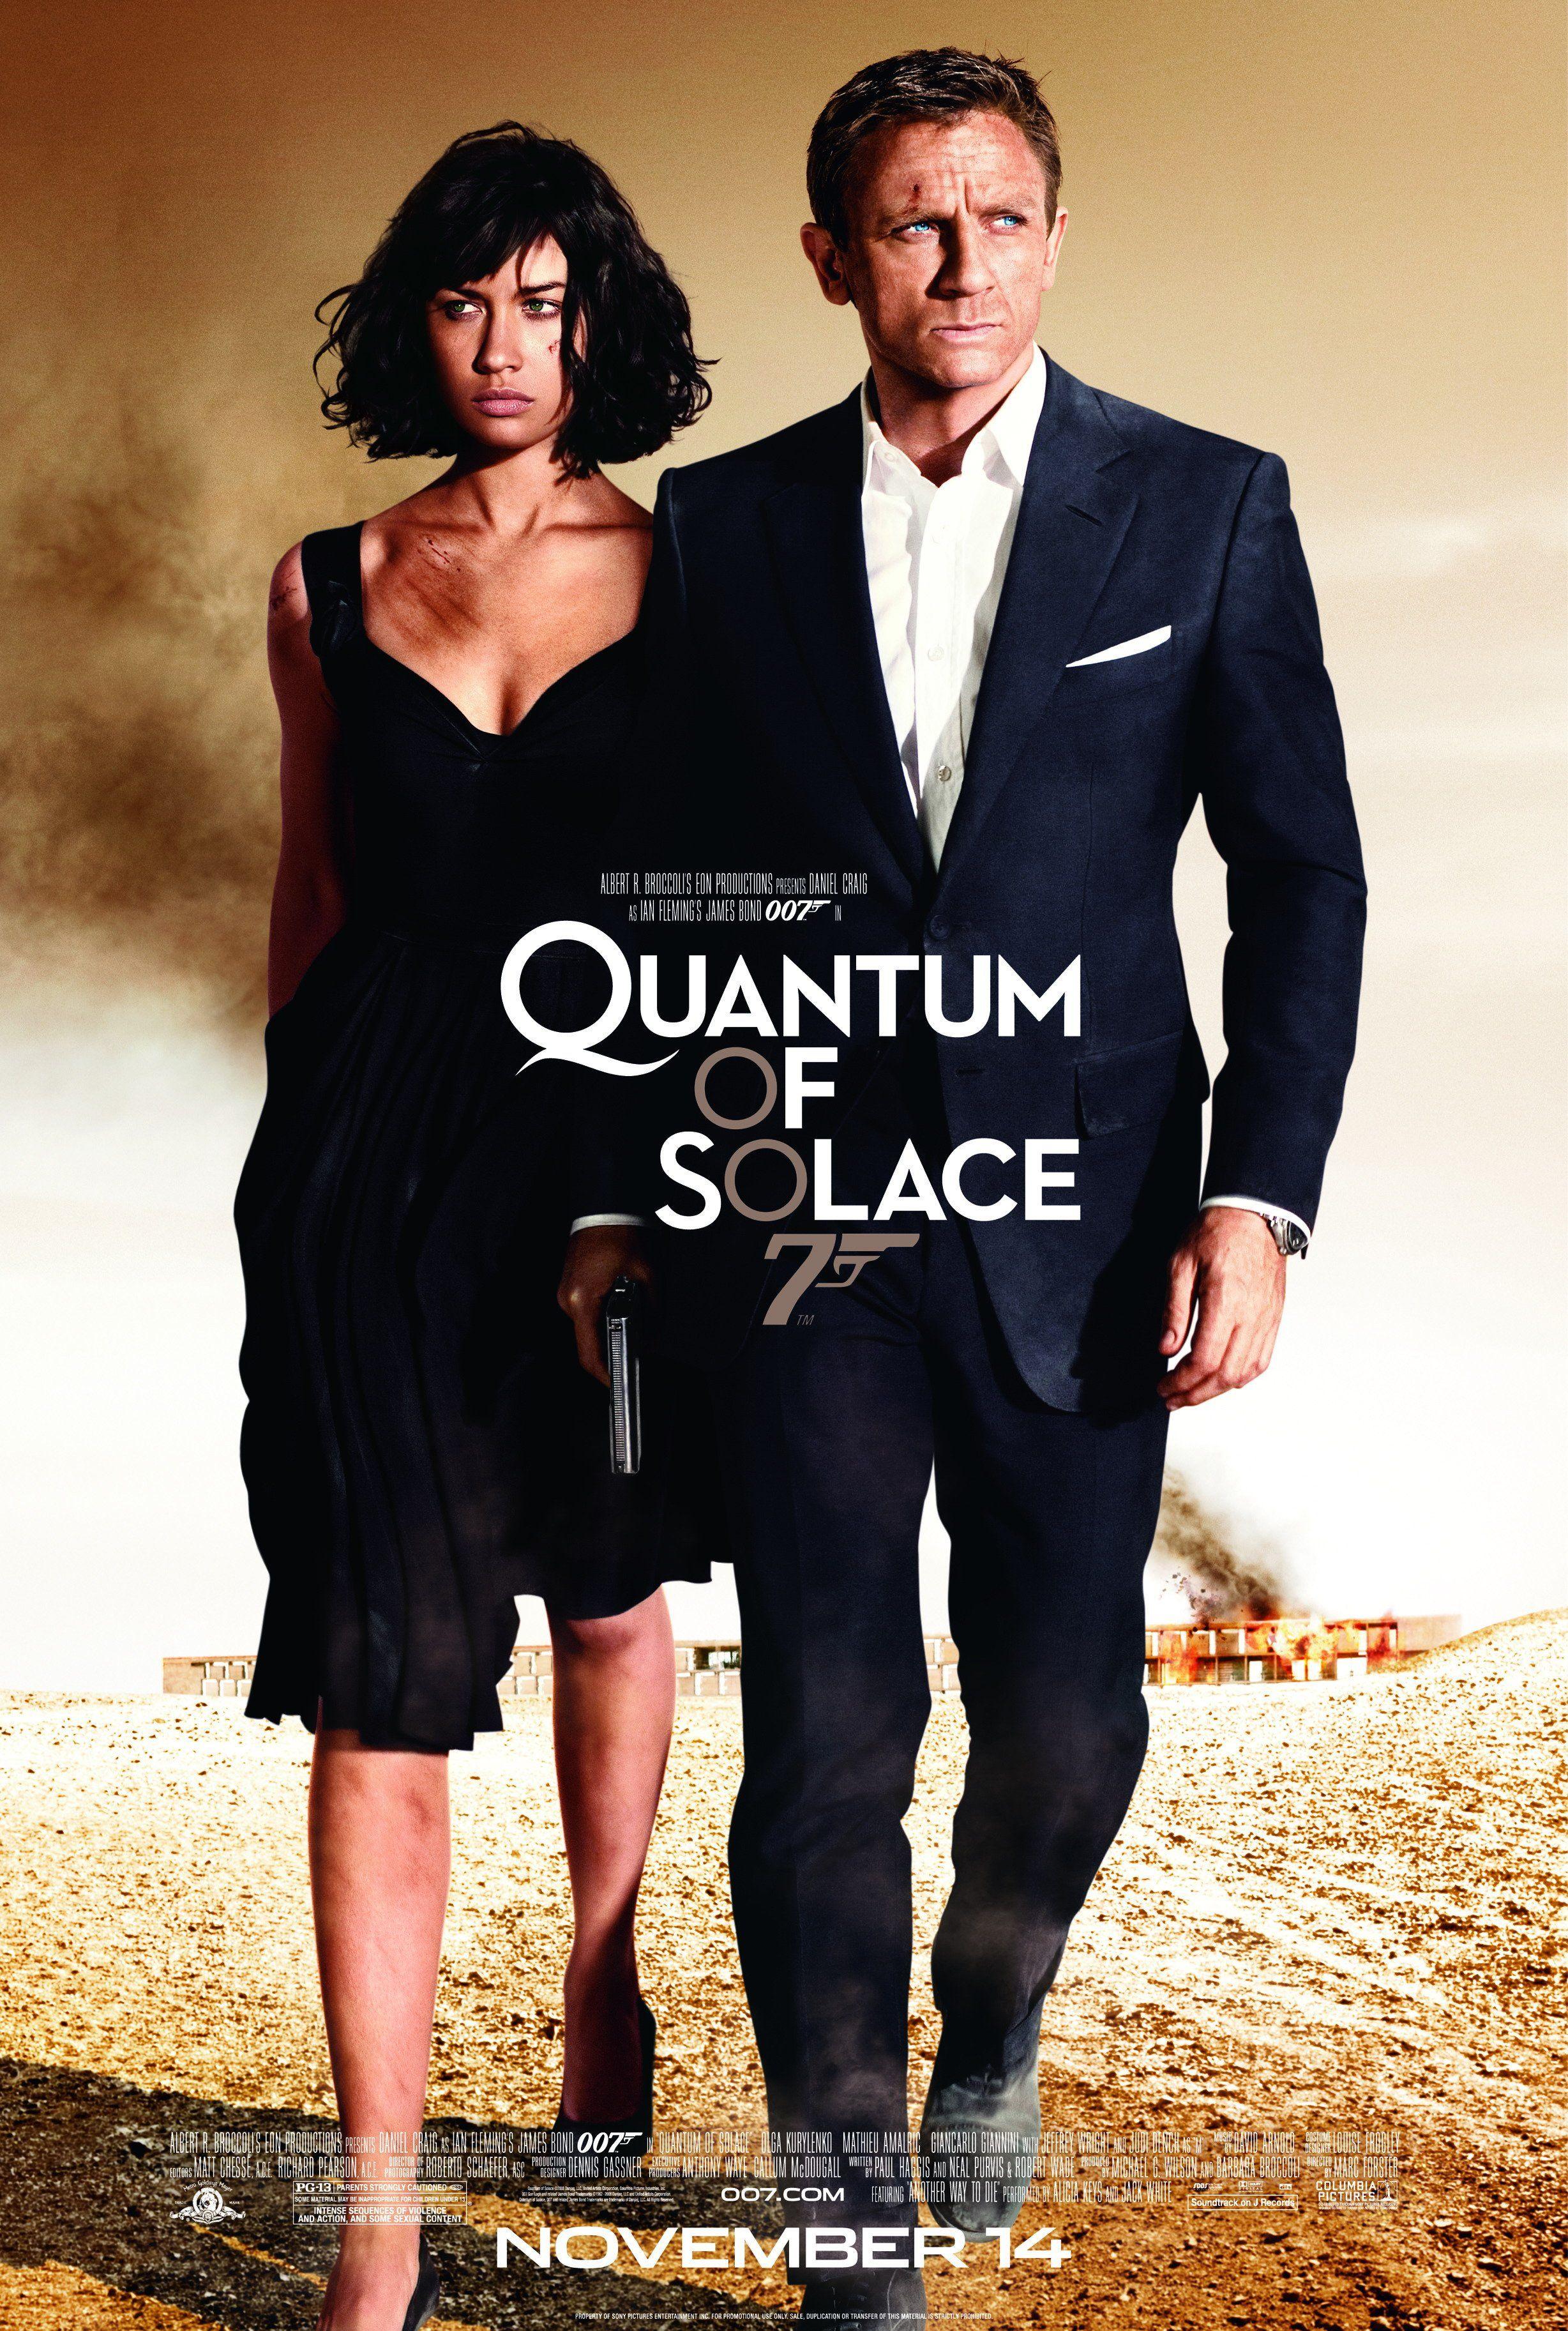 Quantum Of Solace 2008 Daniel Craig James Bond Peliculas Chicas Bond